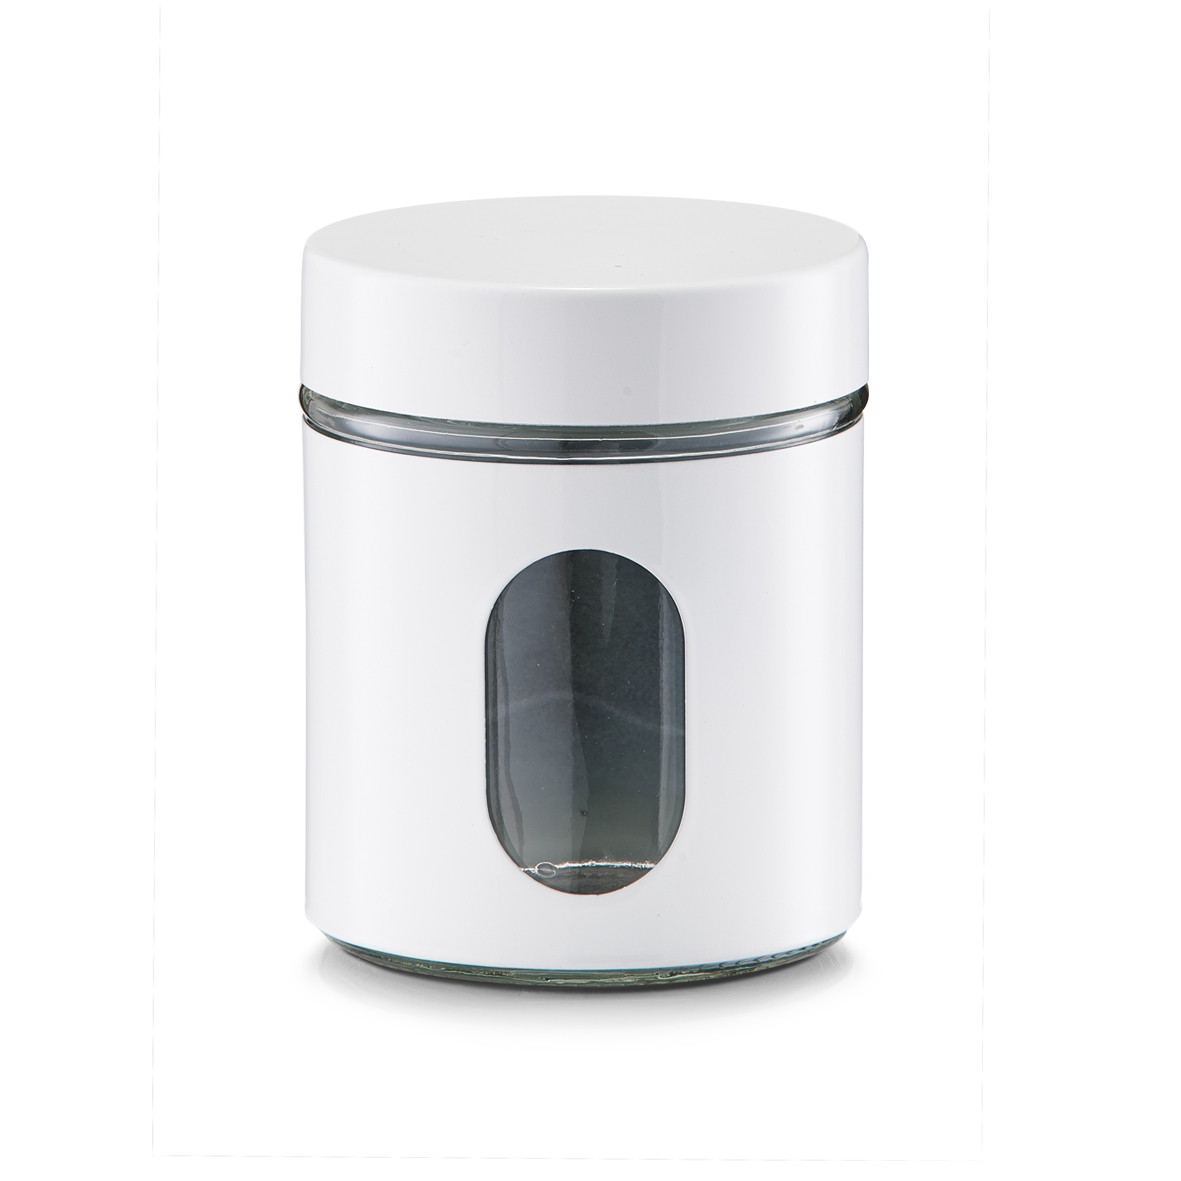 Recipient pentru depozitare Visual, metal si sticla, White 600 ml, Ø 10,2xH12,5 cm imagine